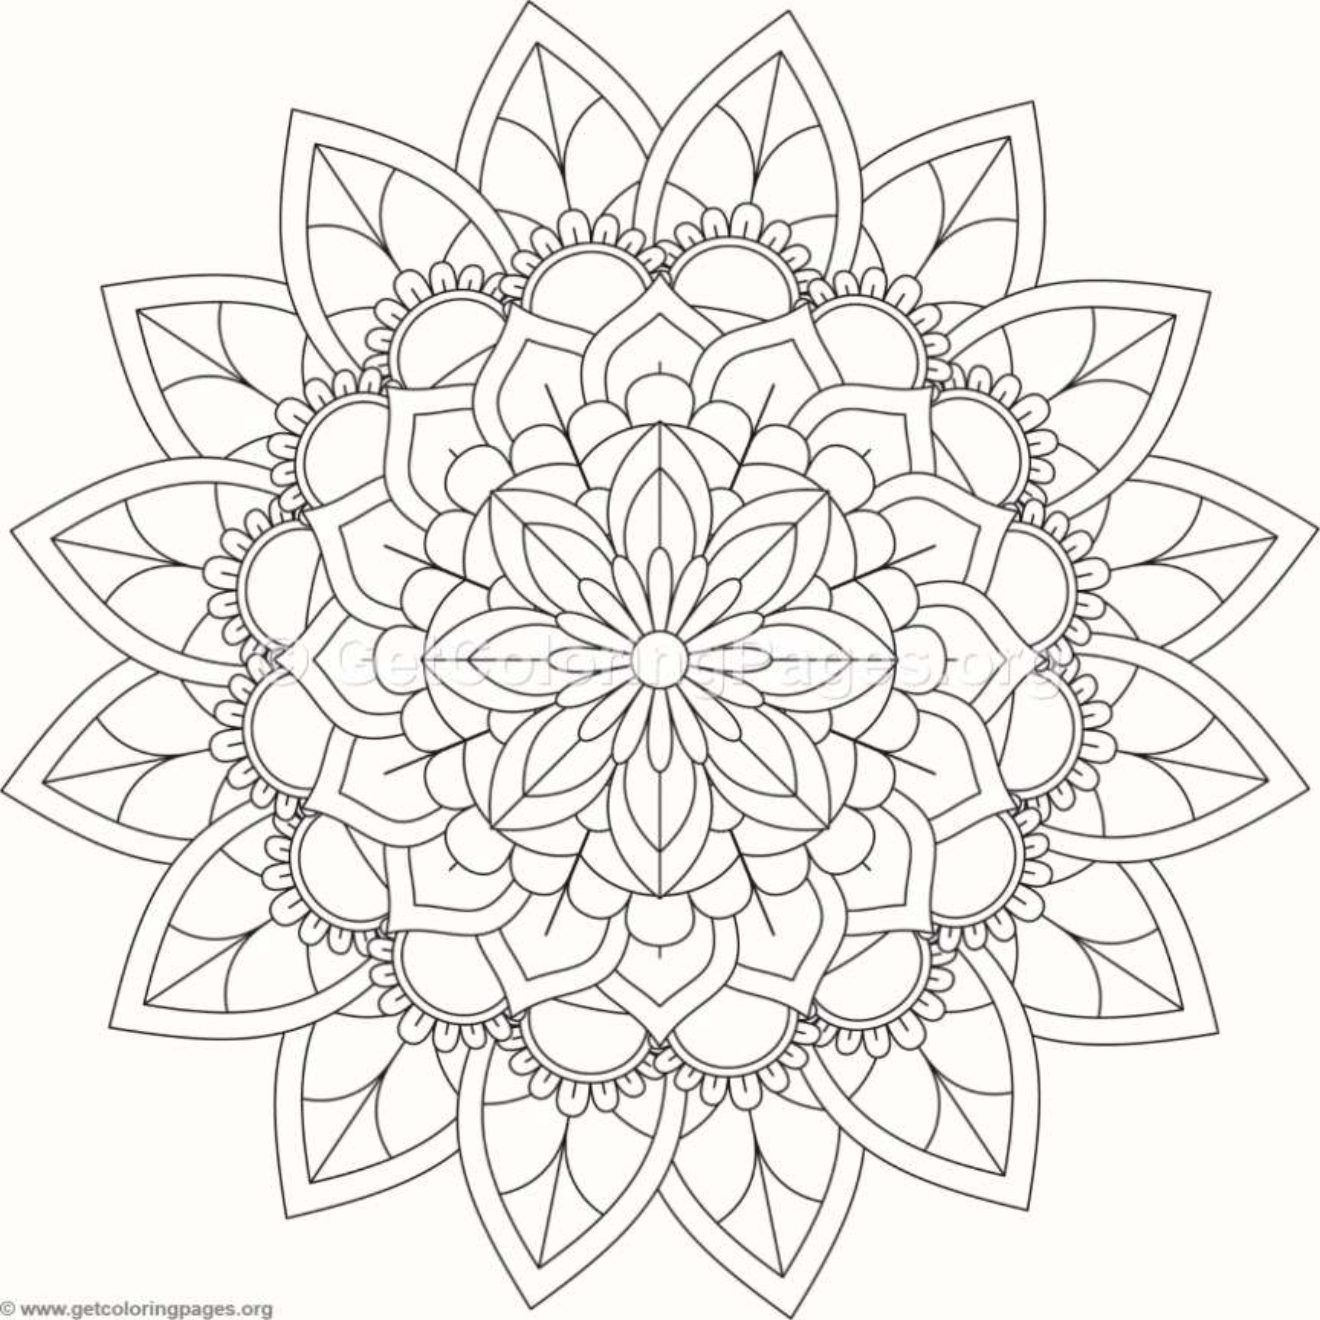 Tribal Mandala Coloring Pages #385 | circulos y formas | Pinterest ...